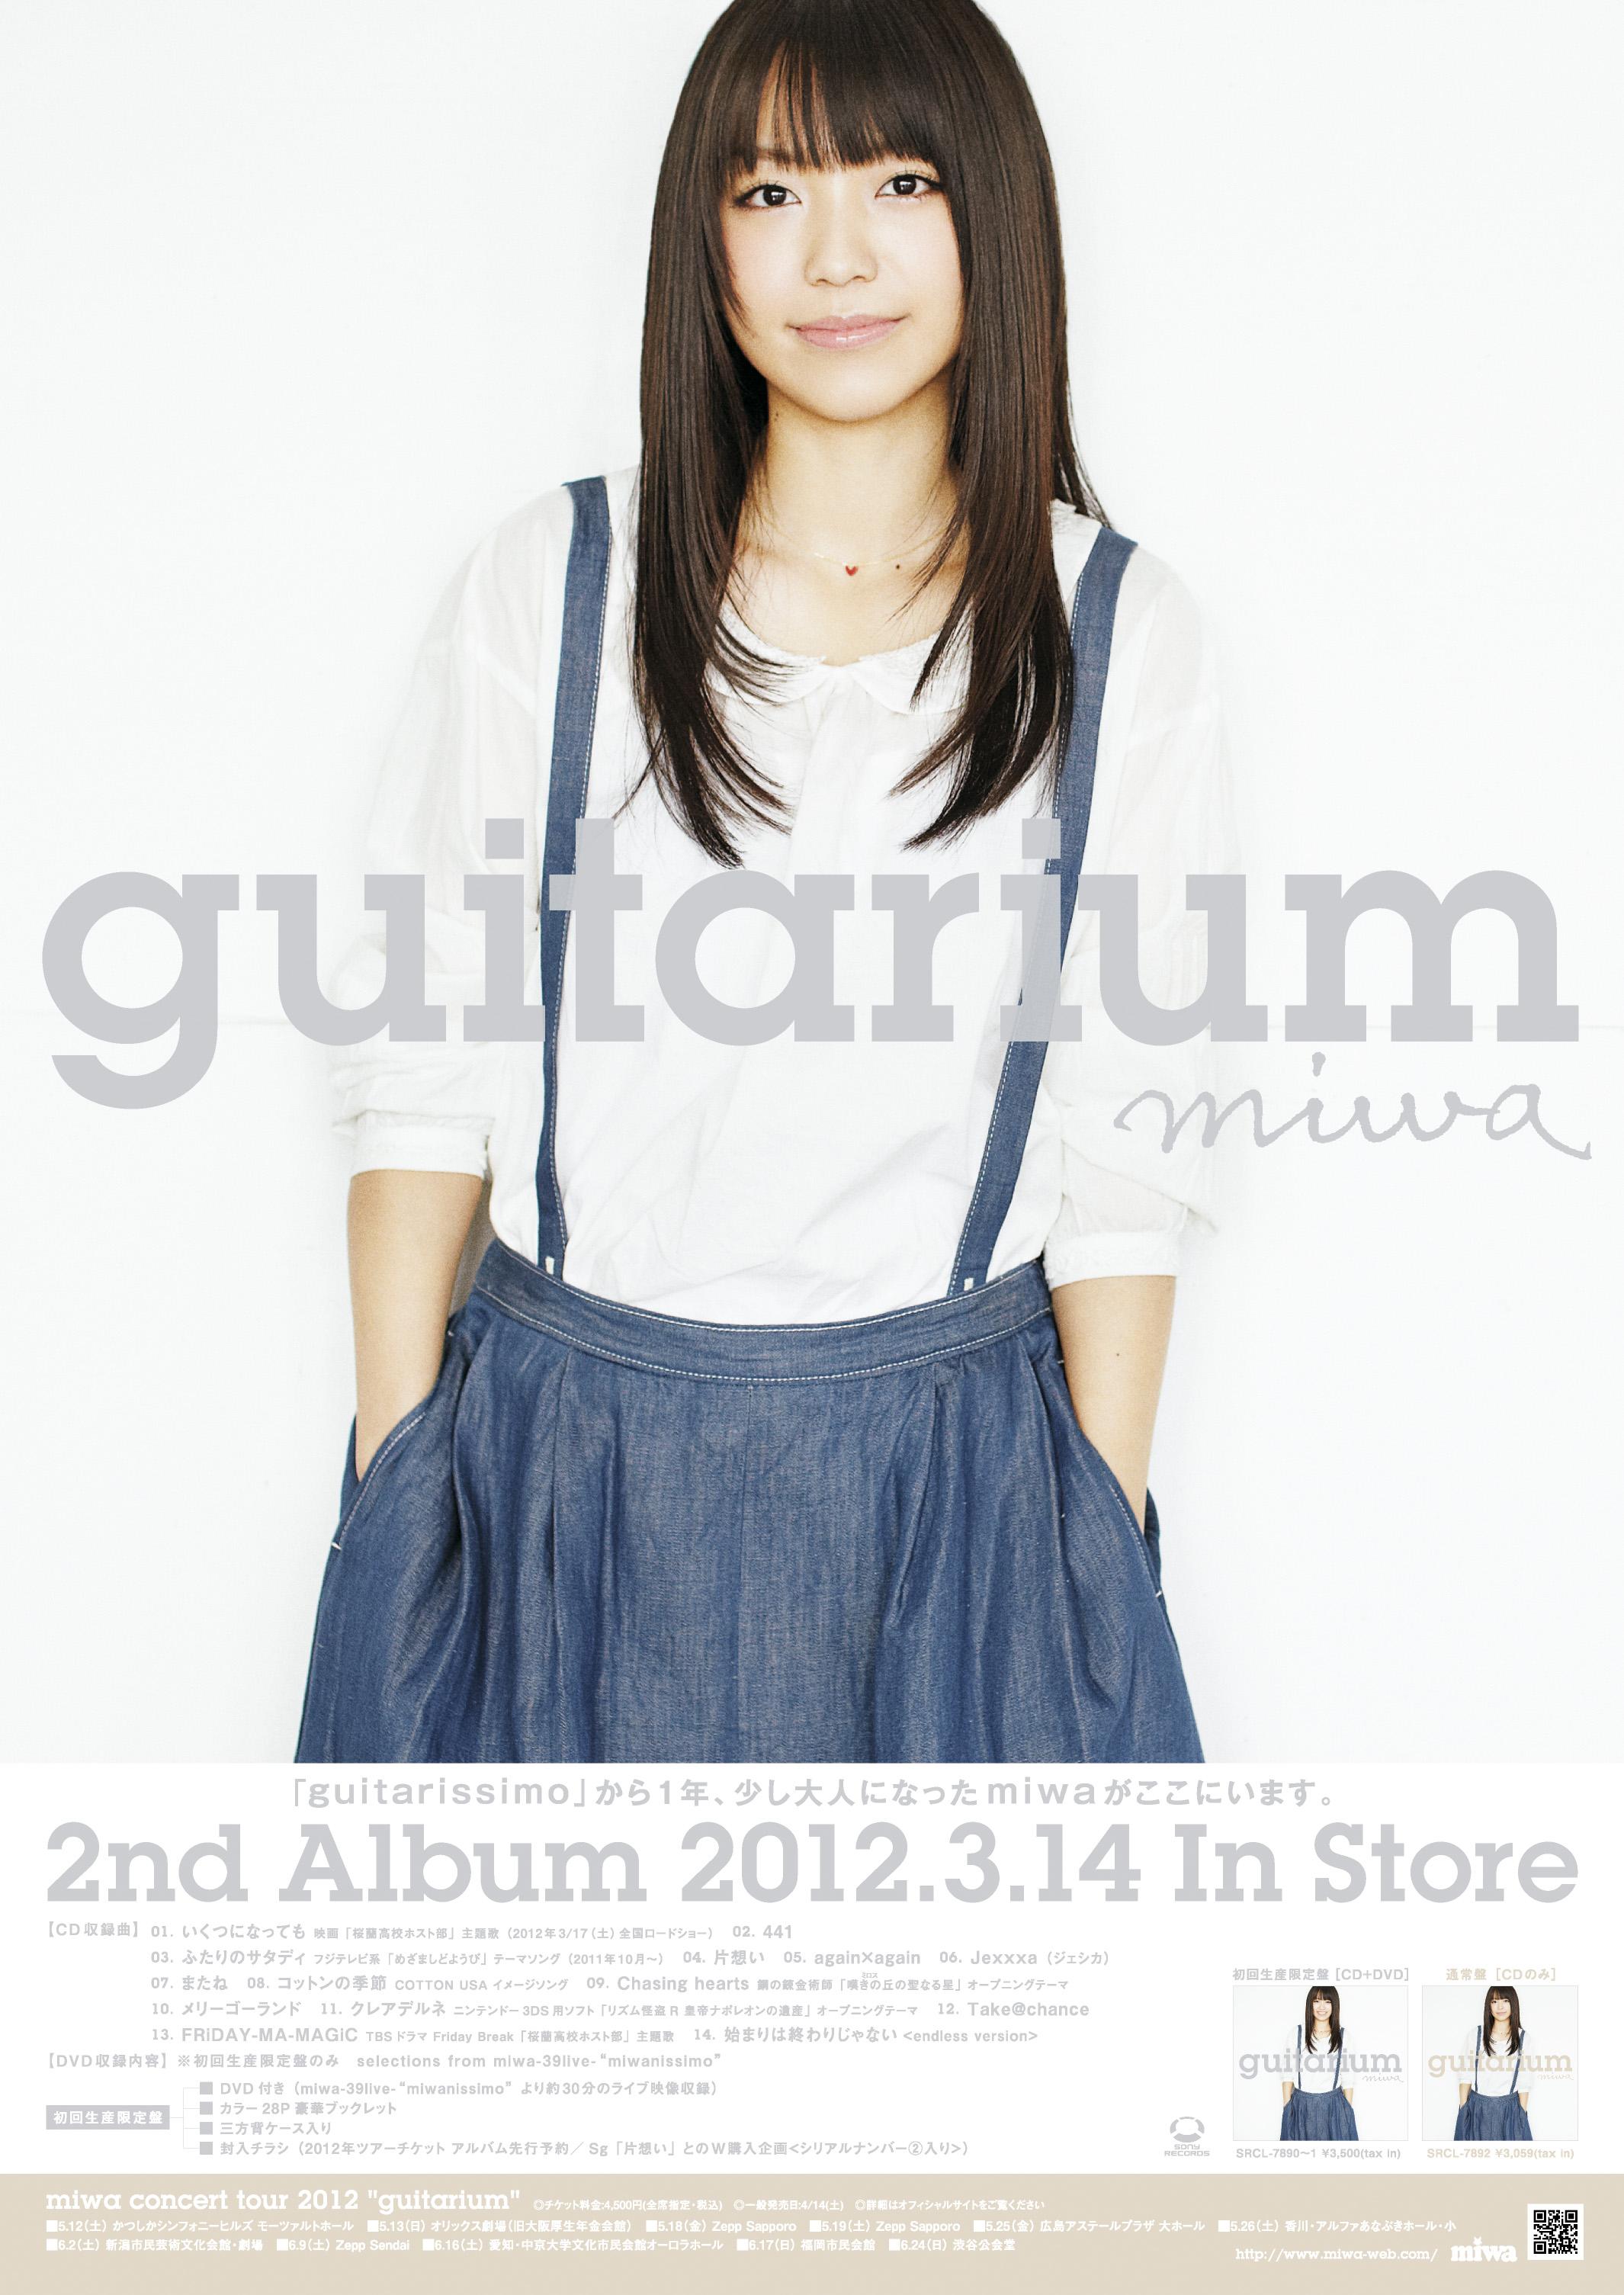 miwa_poster.jpg